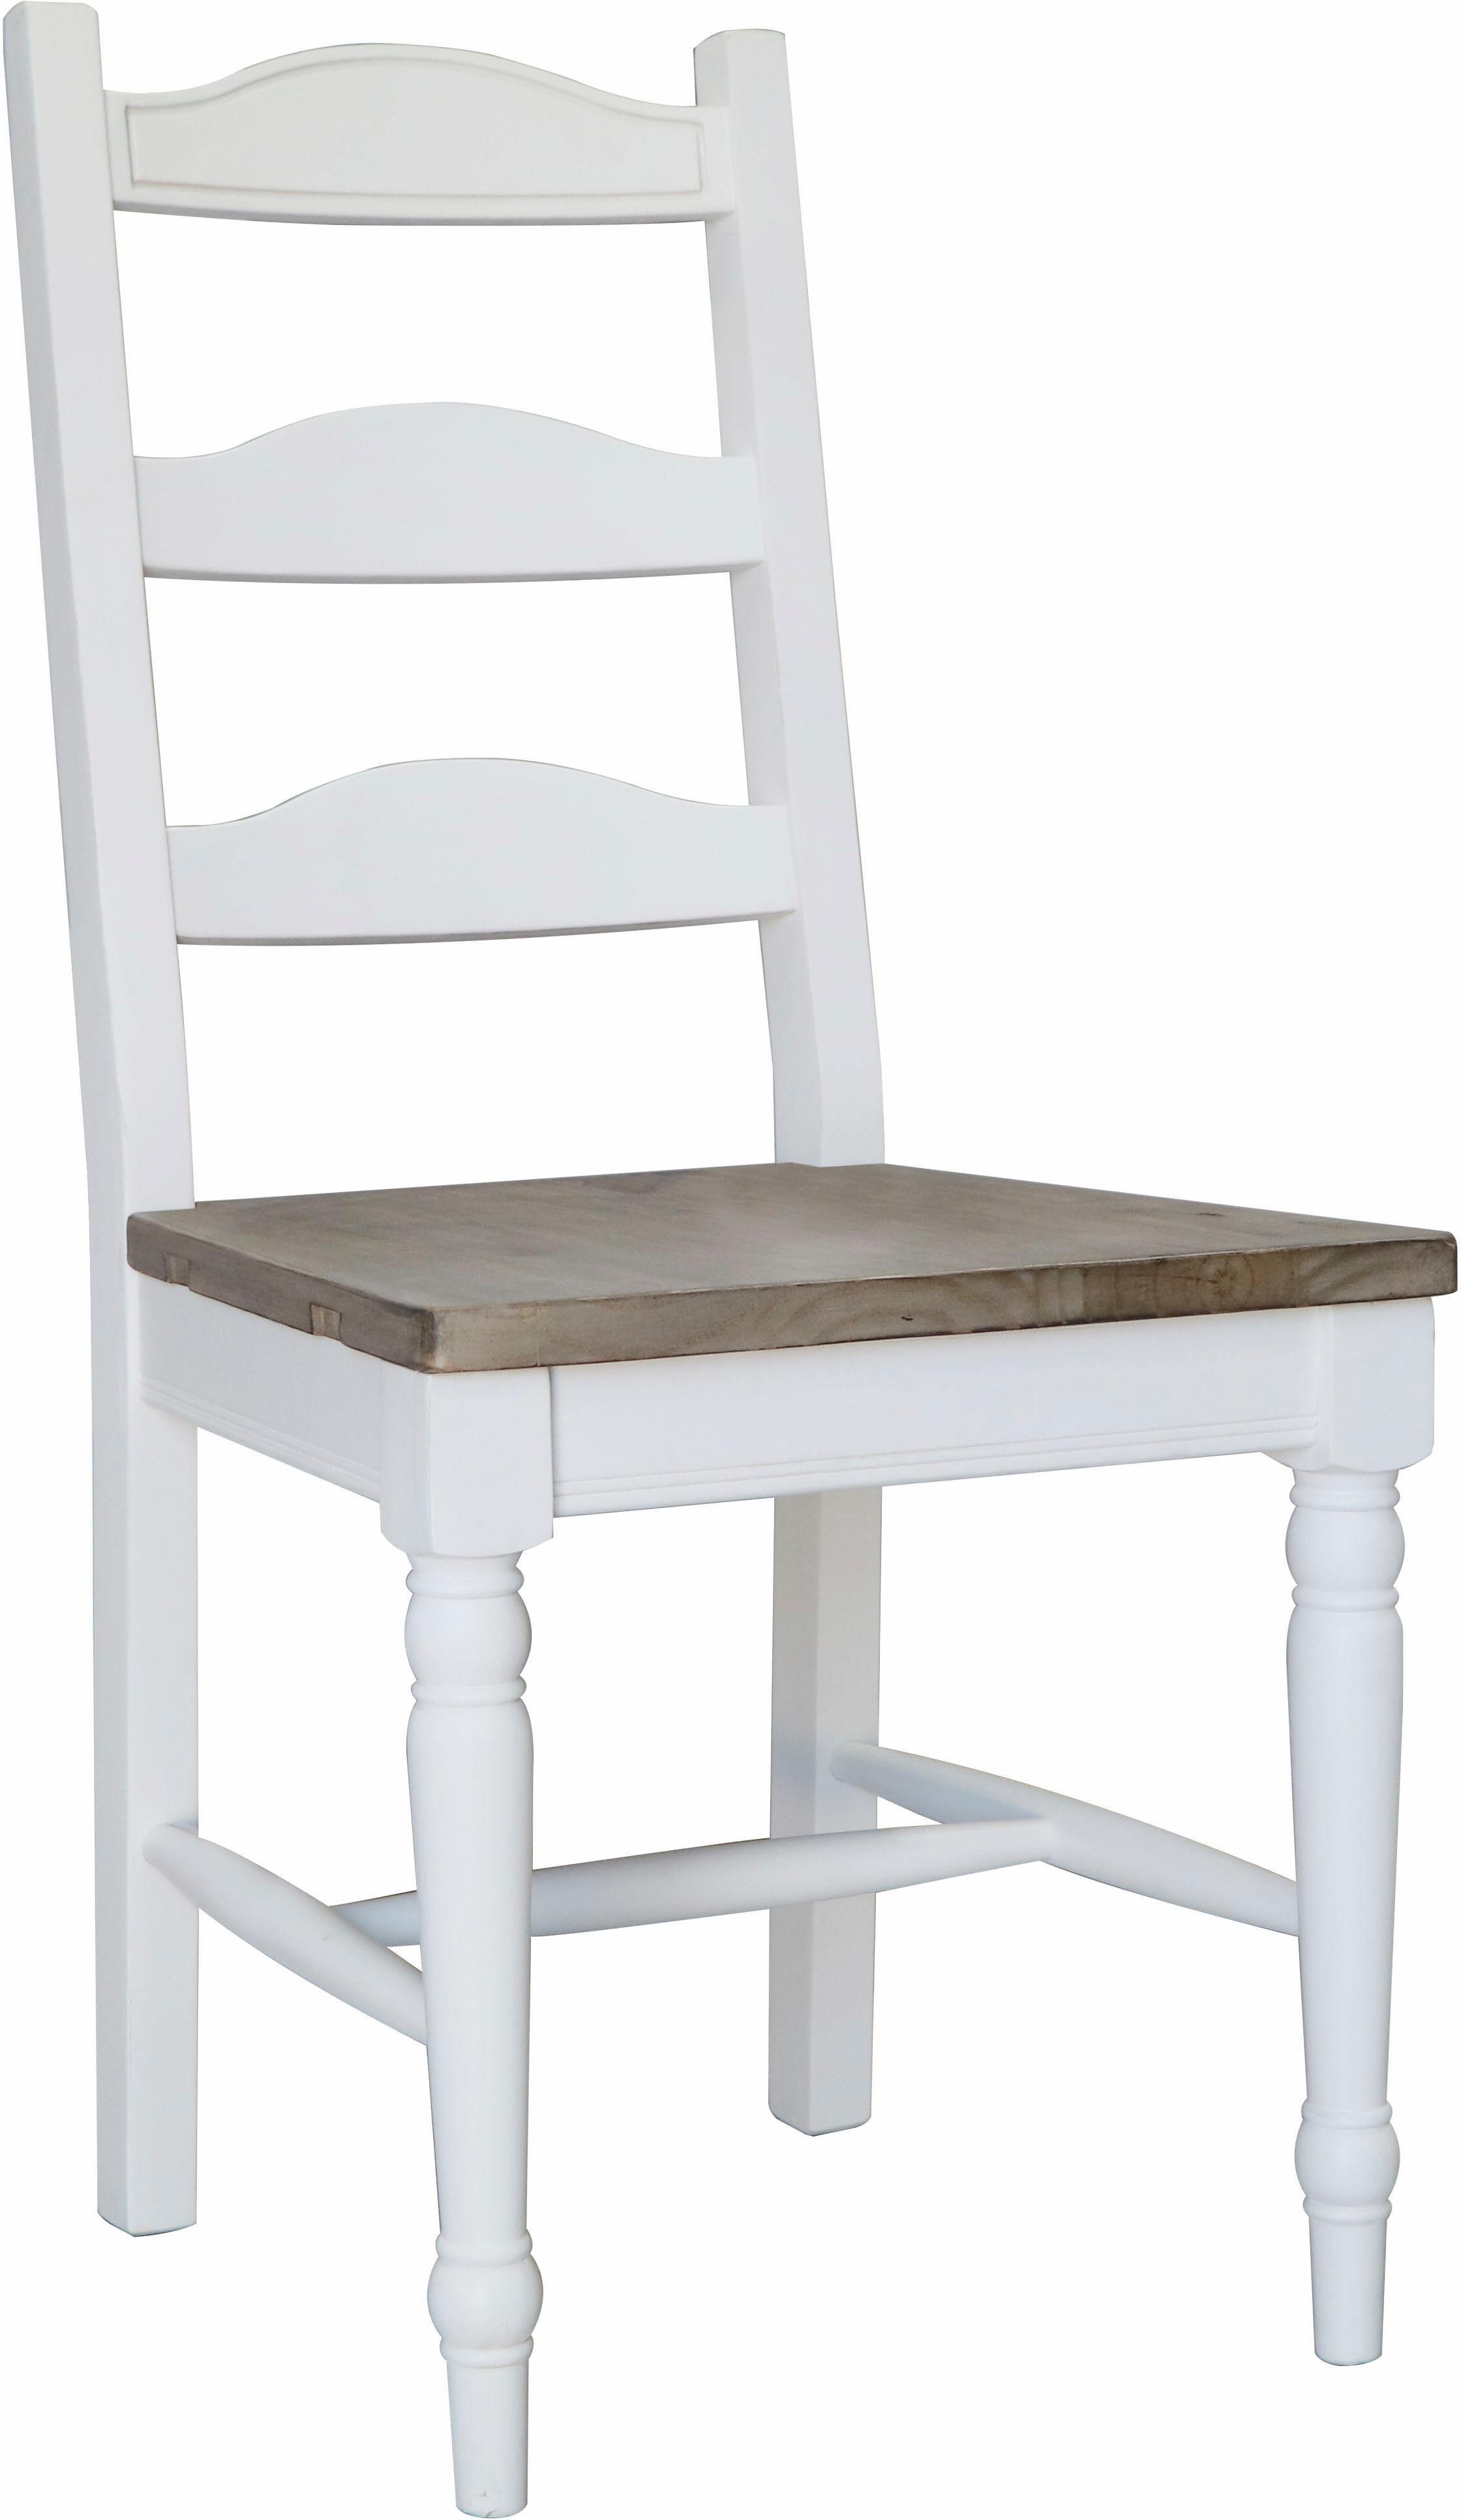 THE WOOD TIMES Stuhl-Set »Vermont«, 2-tlg. Sitzhöhe 45 cm